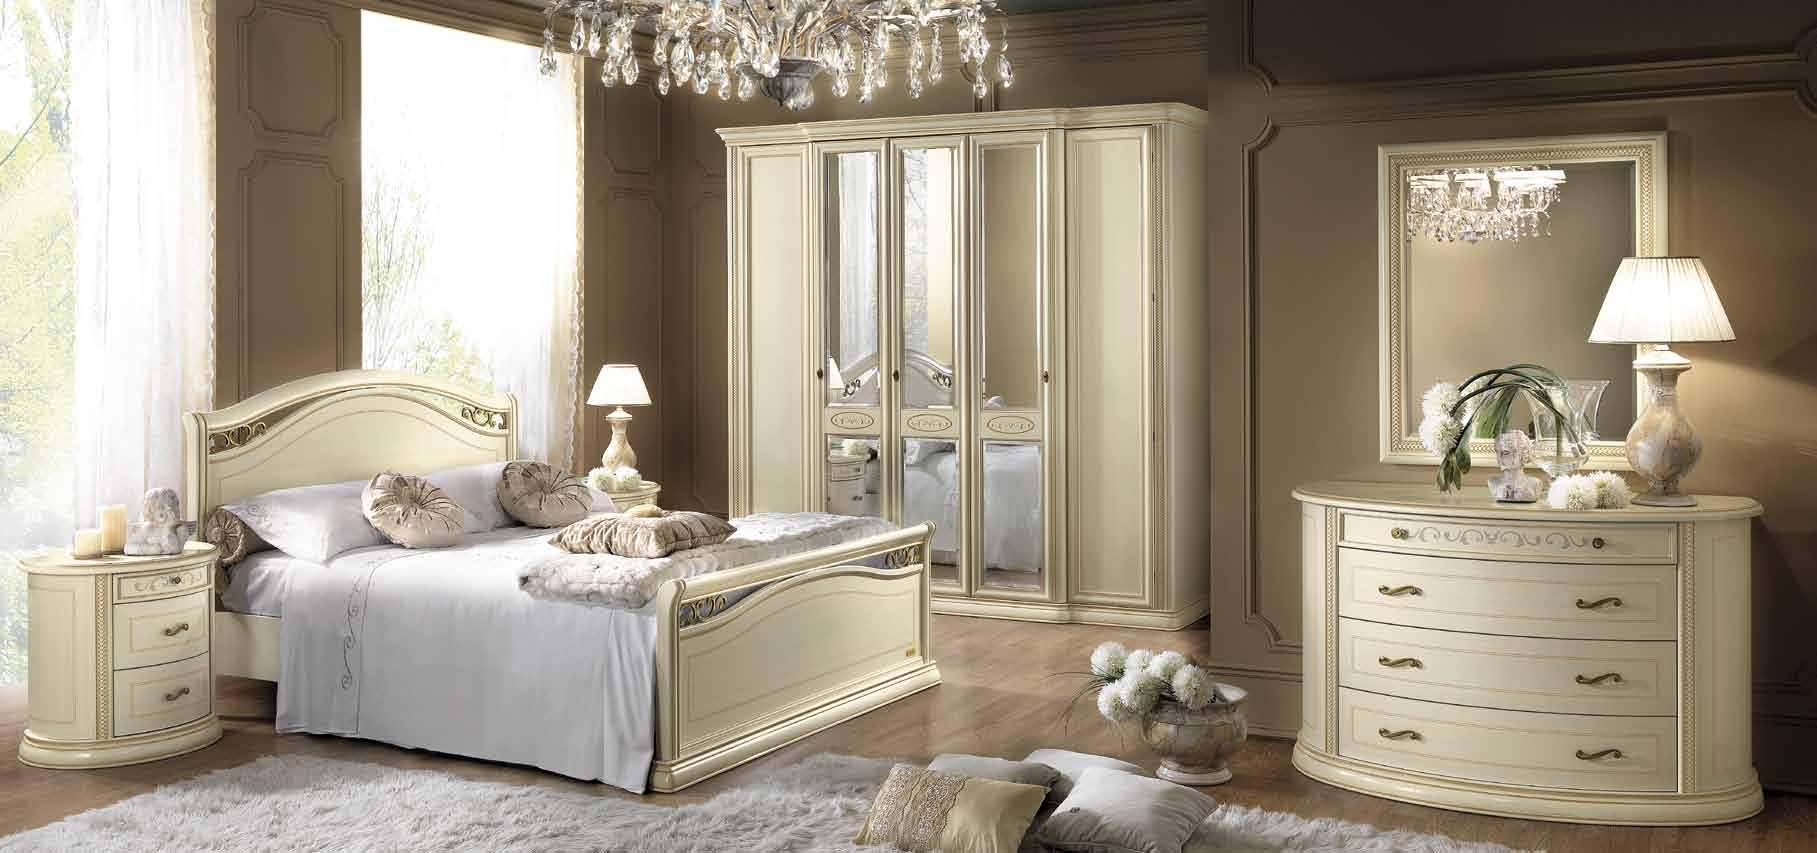 Cream bedroom furniture ideas | Hawk Haven